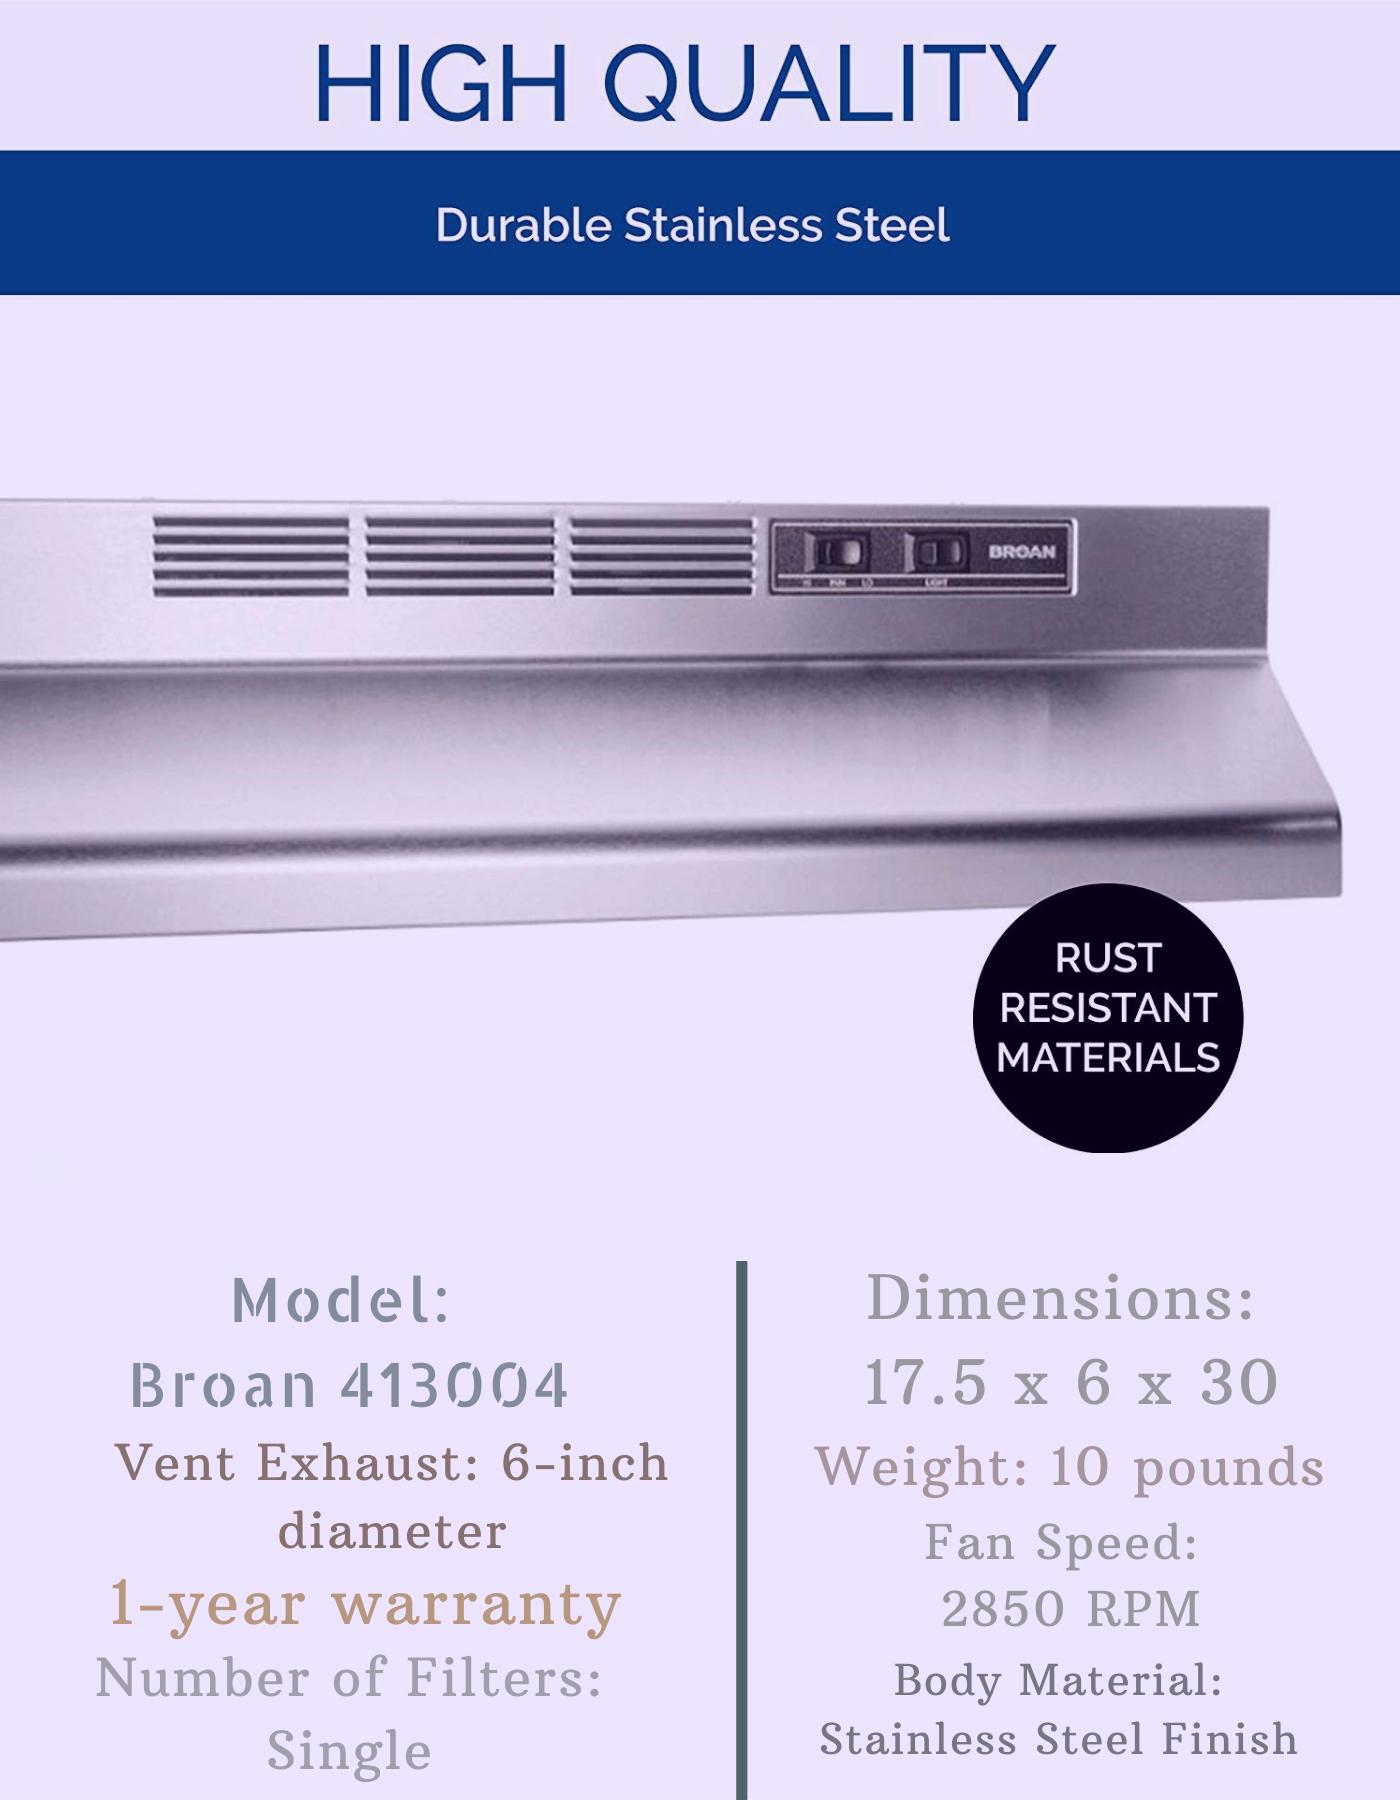 Broan Nutone 413004 30 Range Hood Single Charcoal Filter Voltage 120 V 60 Hz Ductless Range Hood Ductless Range Hood